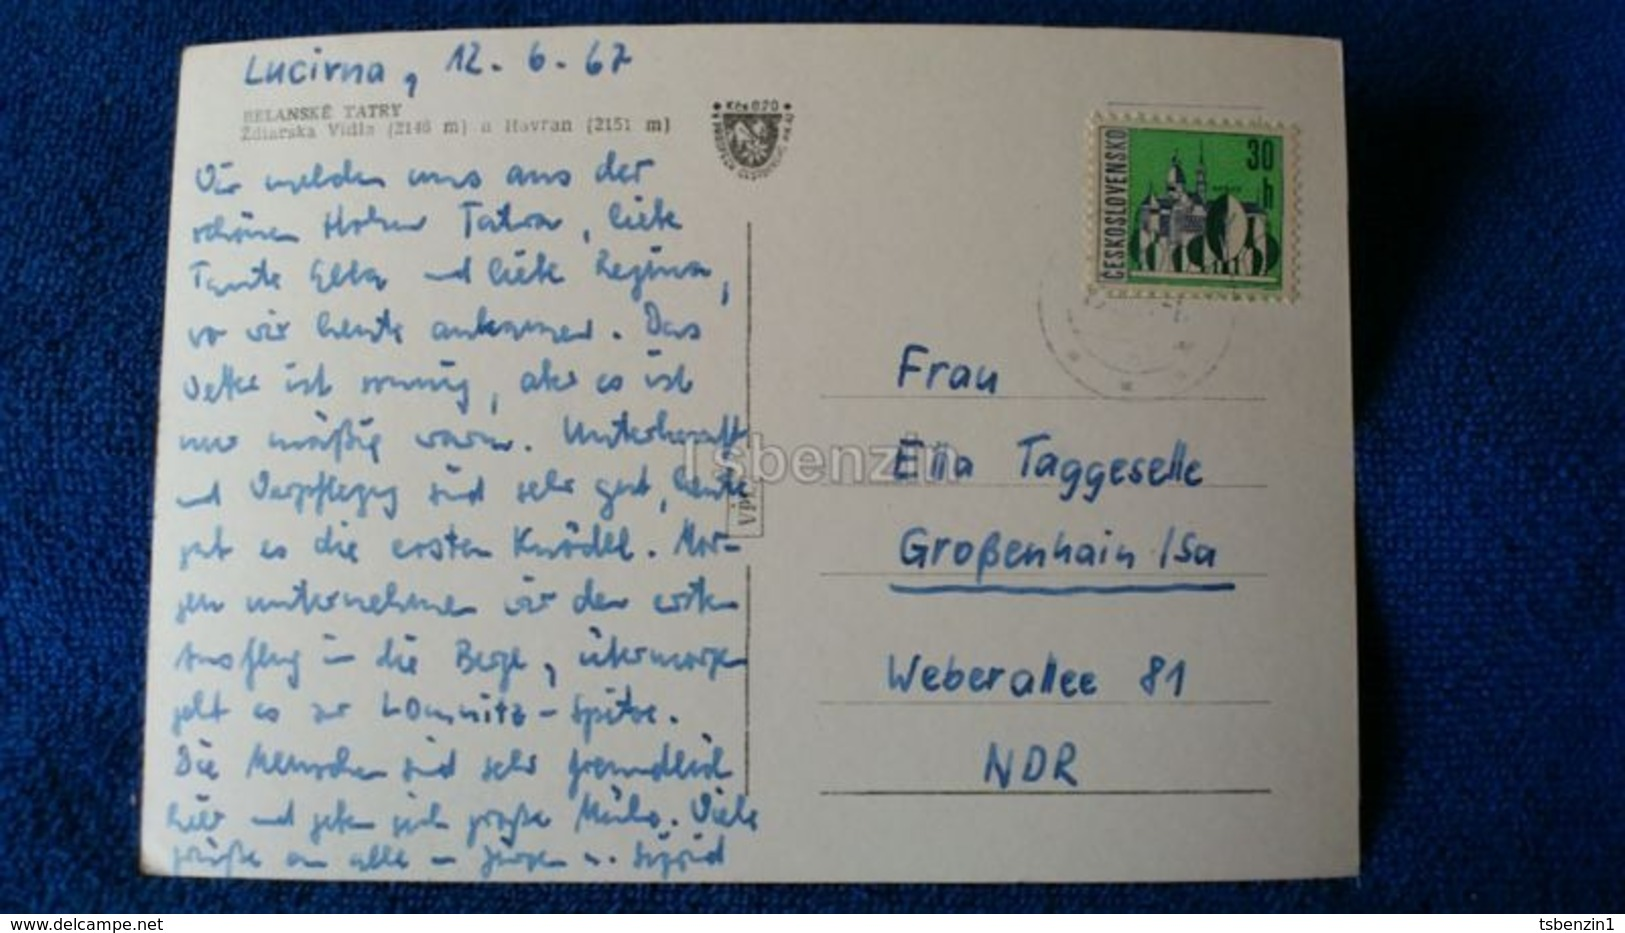 Belianske Tatry Zdiarska Vidla Slovakia - Slovacchia